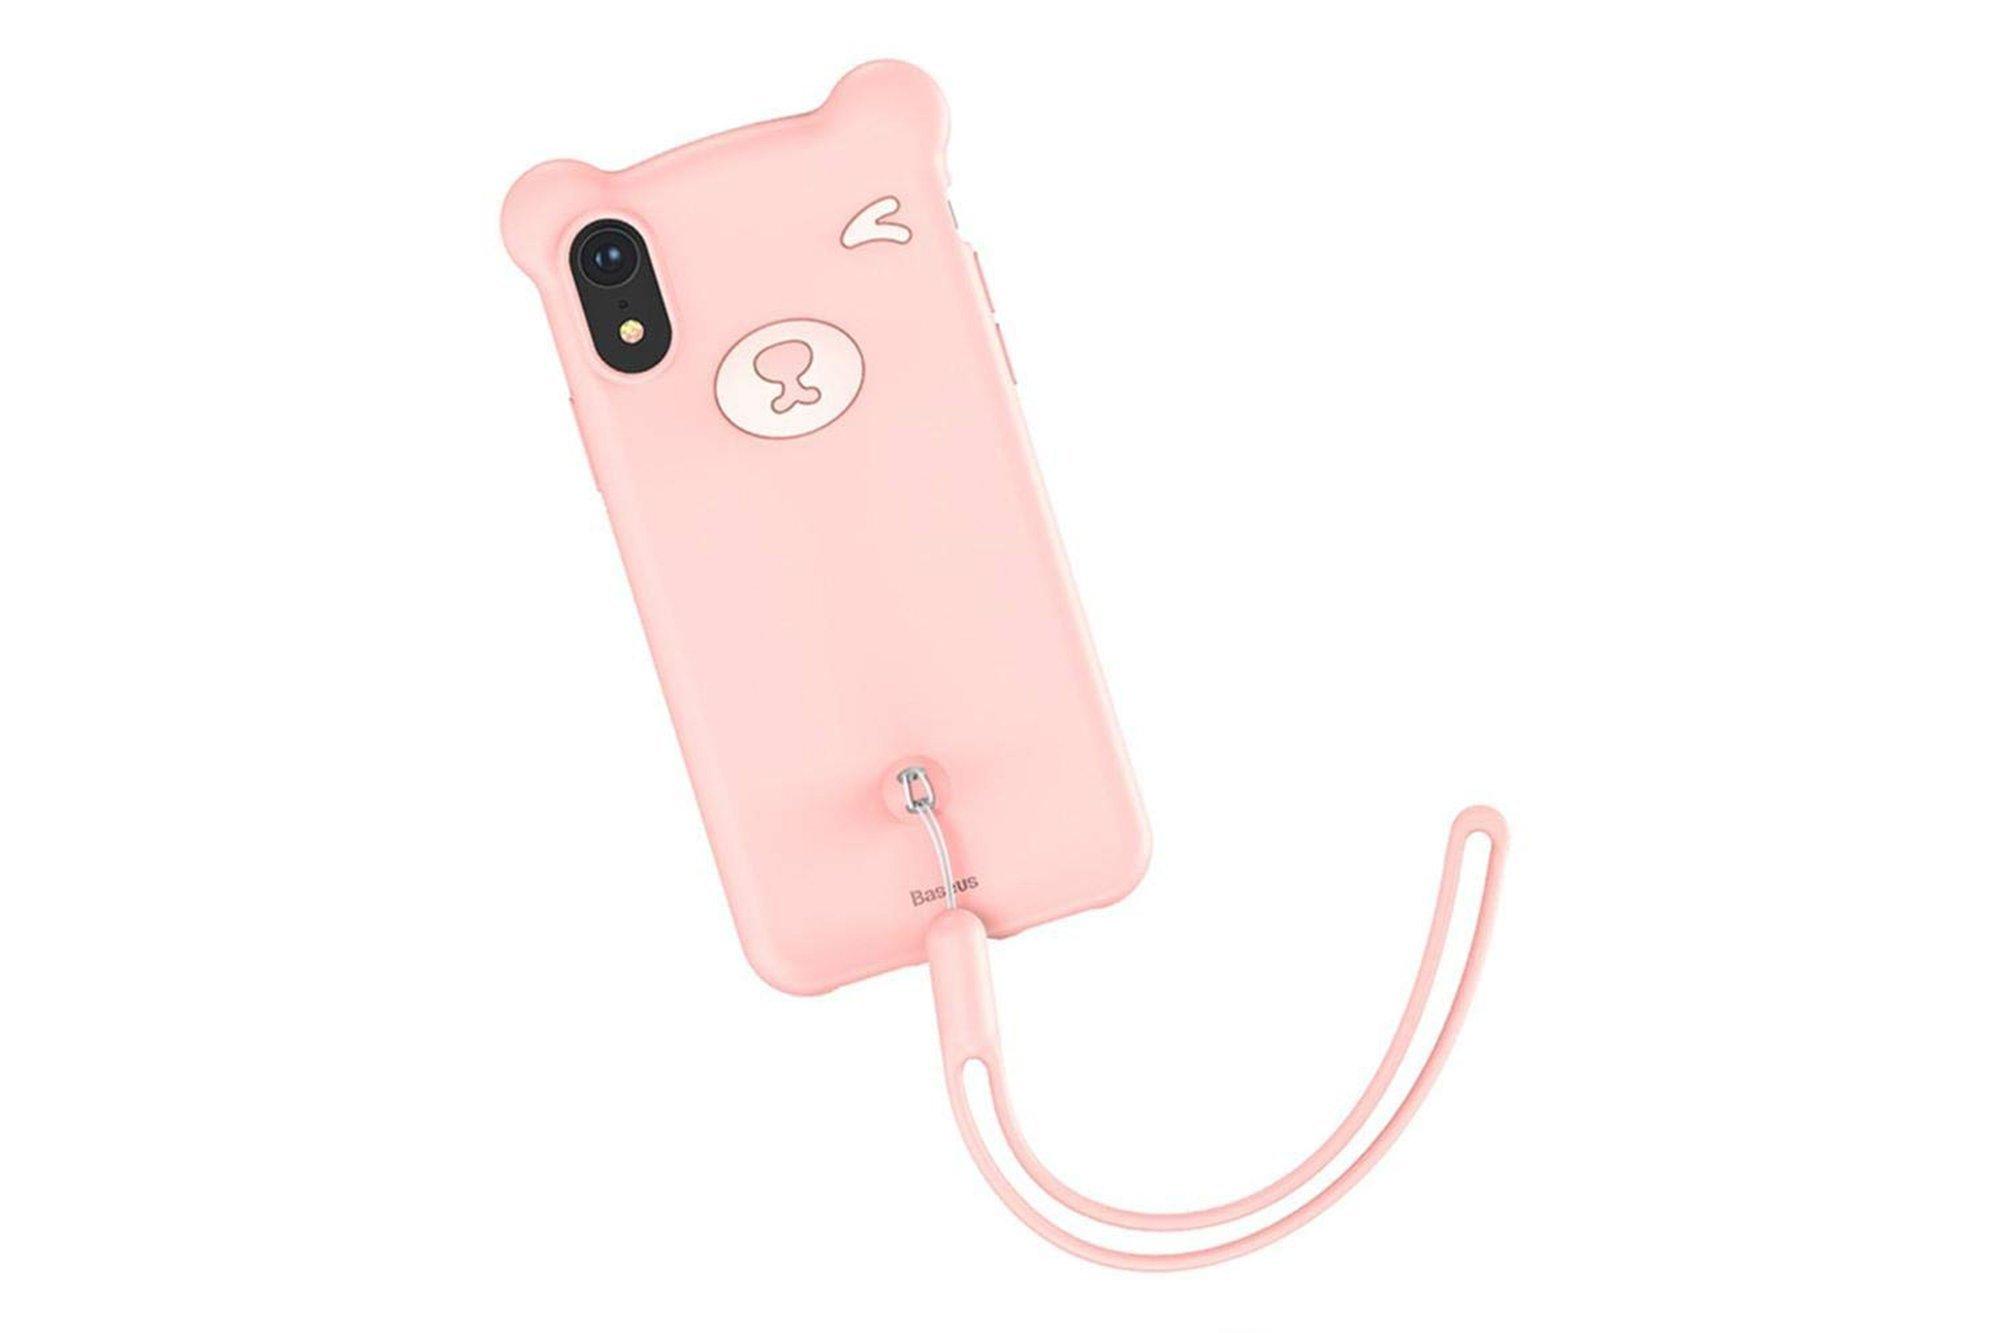 Telefonhülle Baseus Bär Silikon Hülle Silizium iPhone XS / X Pink